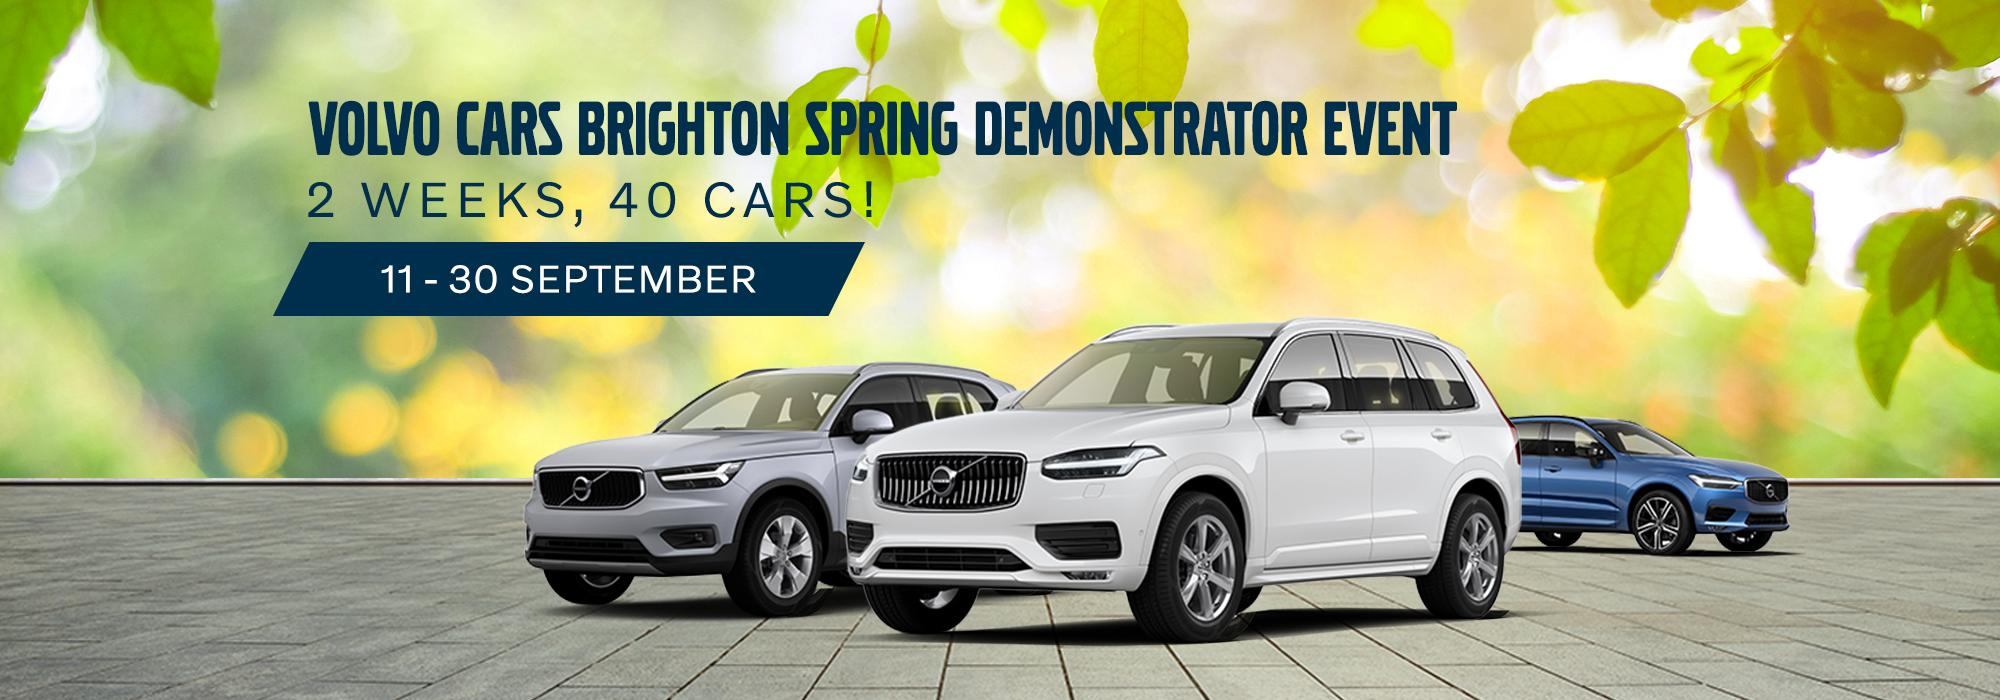 The Volvo Cars Brighton Spring Demonstrator Event